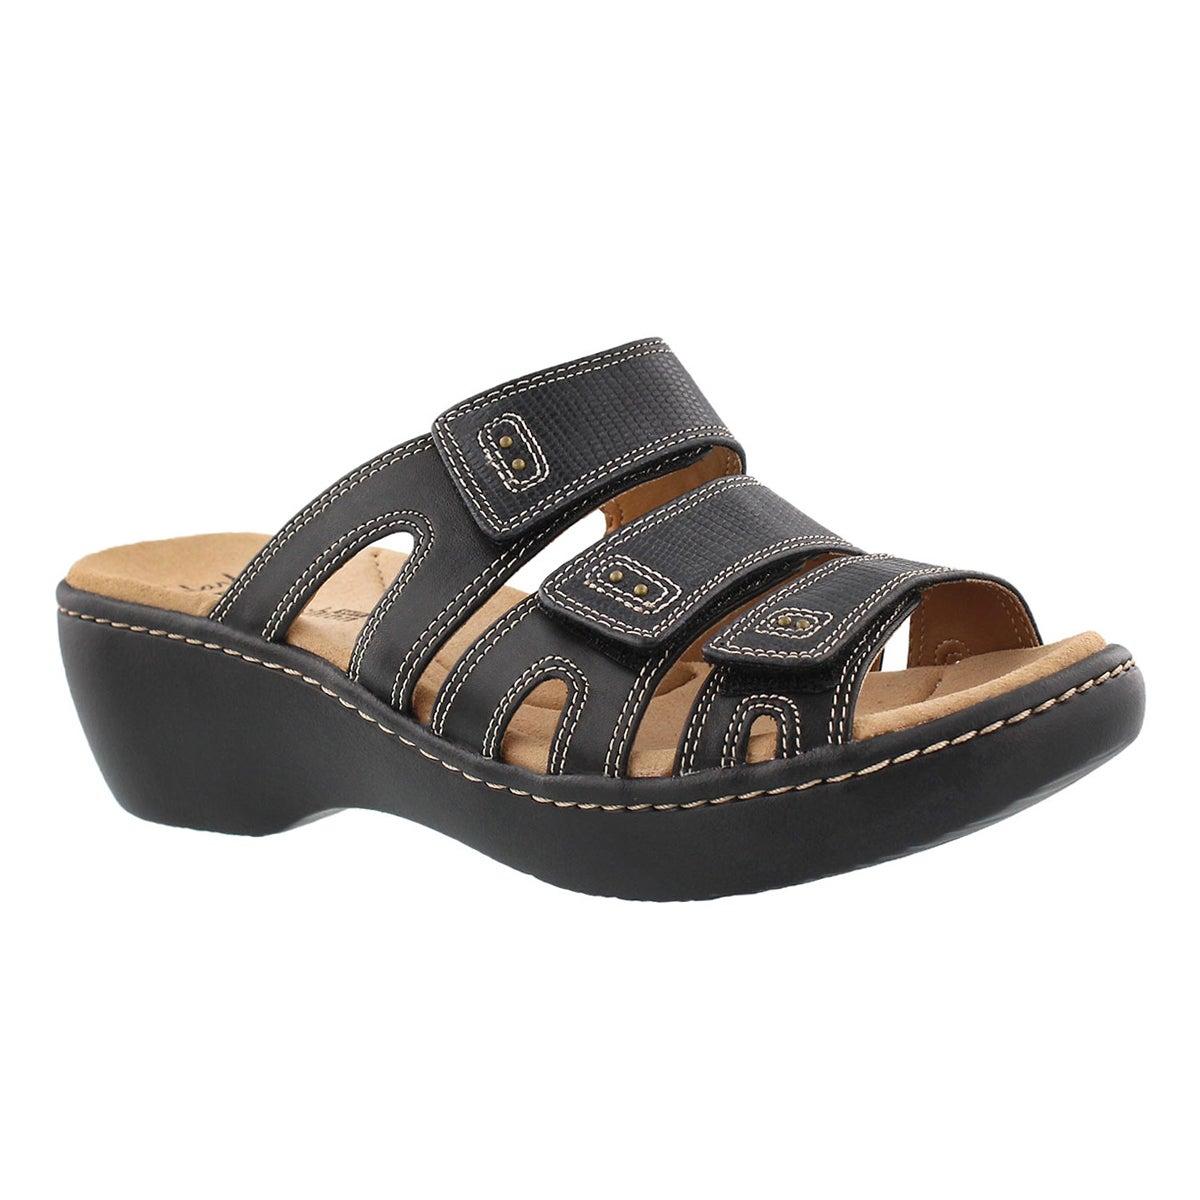 Women's DELANA DAMIR black casual slide sandals